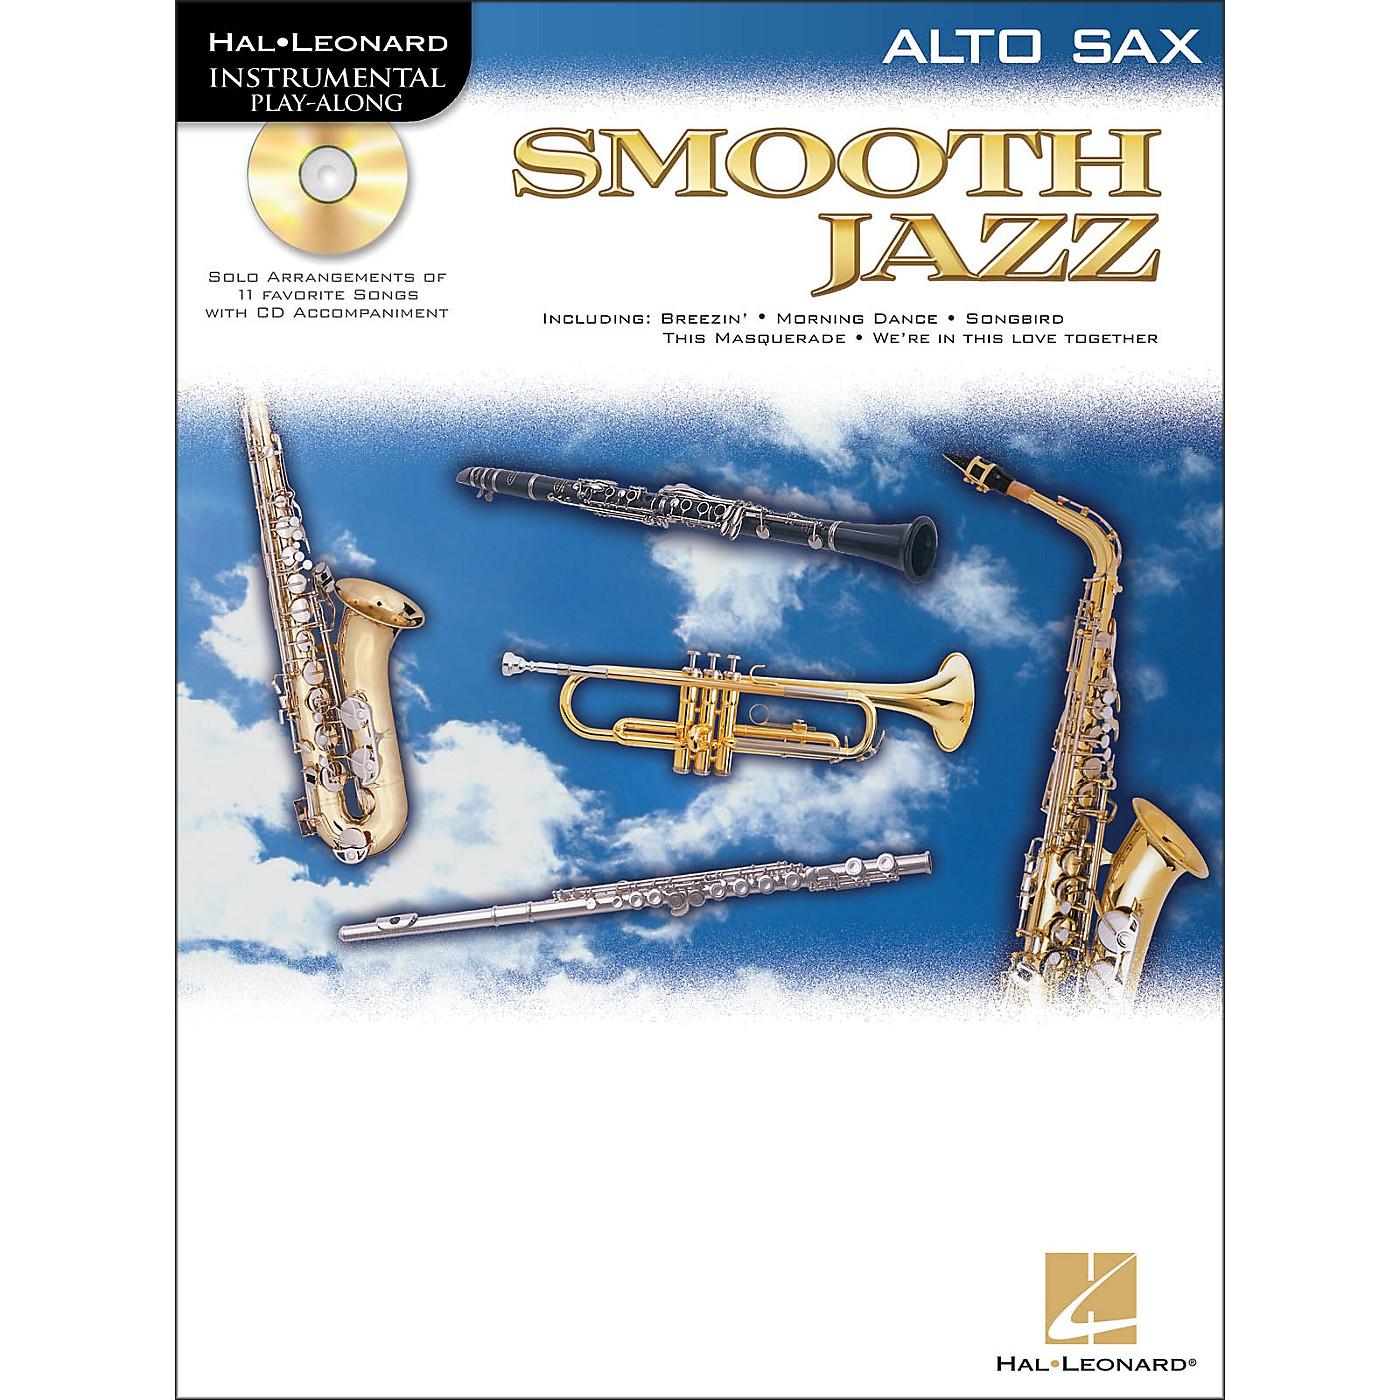 Hal Leonard Smooth Jazz for Alto Sax Book/CD thumbnail